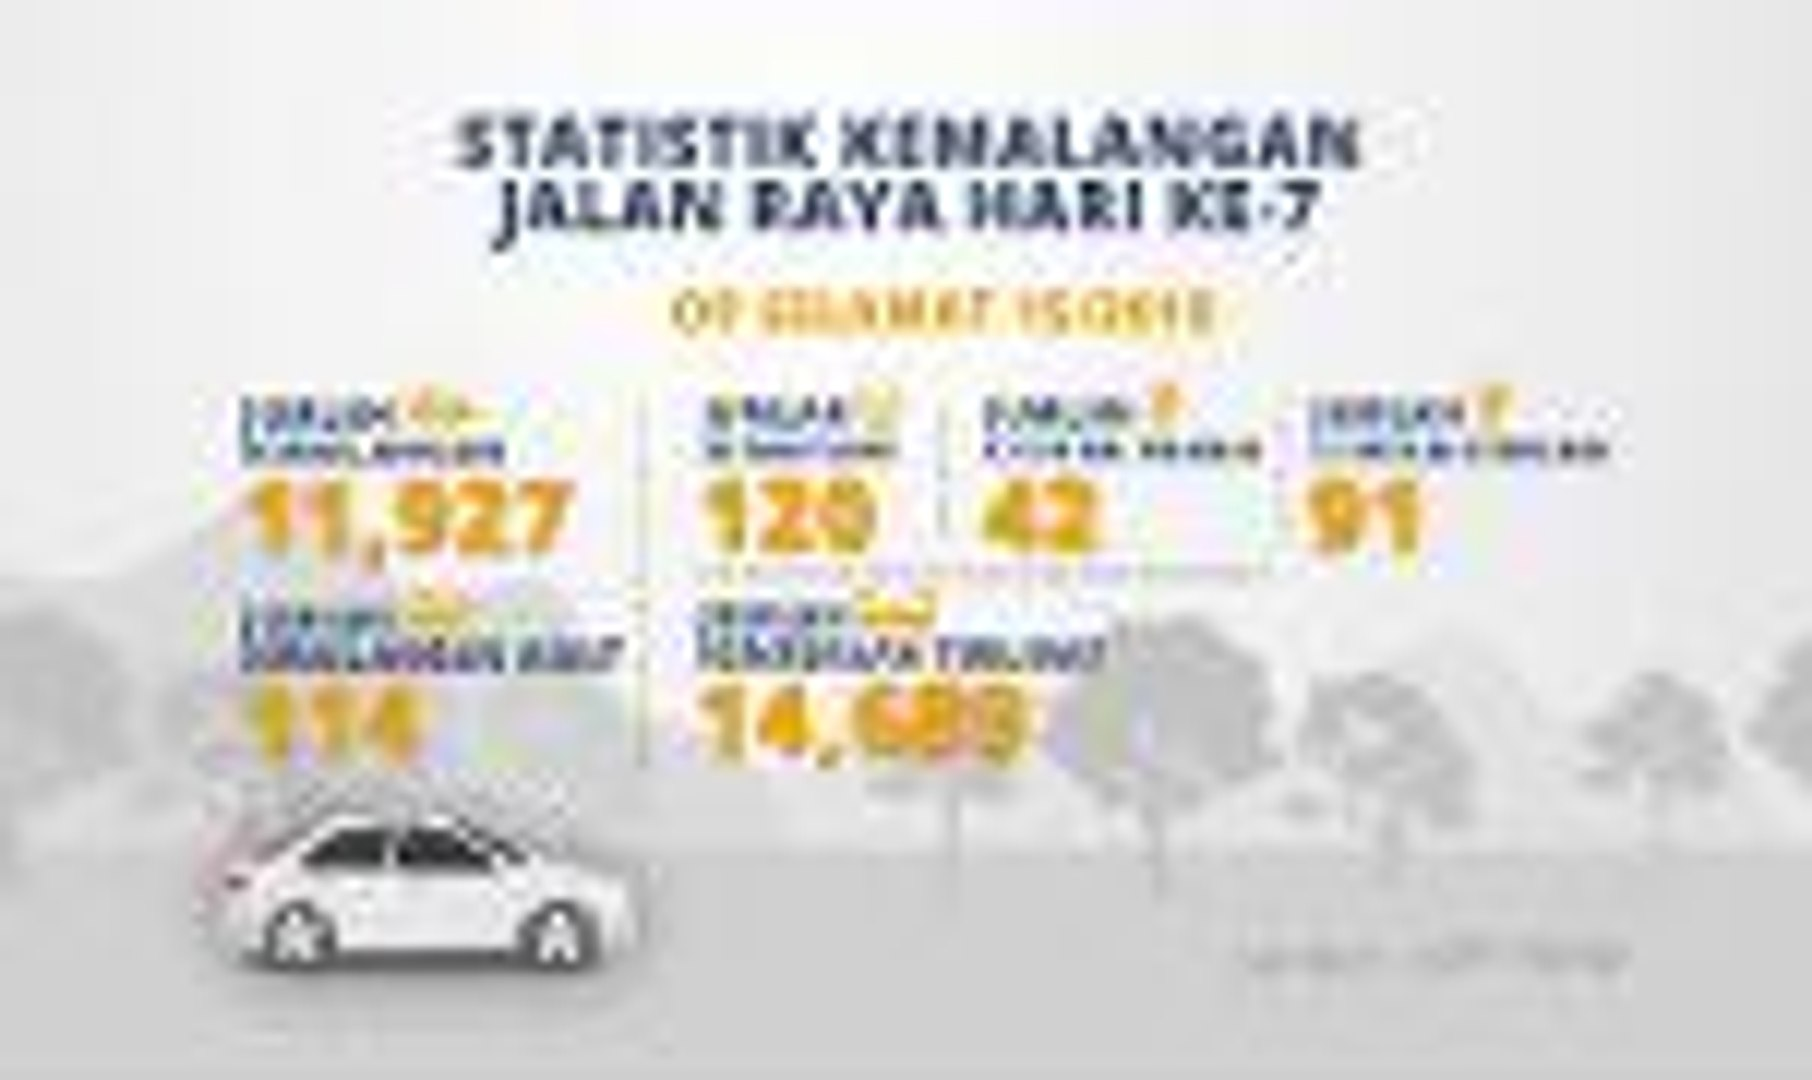 Infografik Statistik Kemalangan Jalan Raya Hari Ke 7 Video Dailymotion